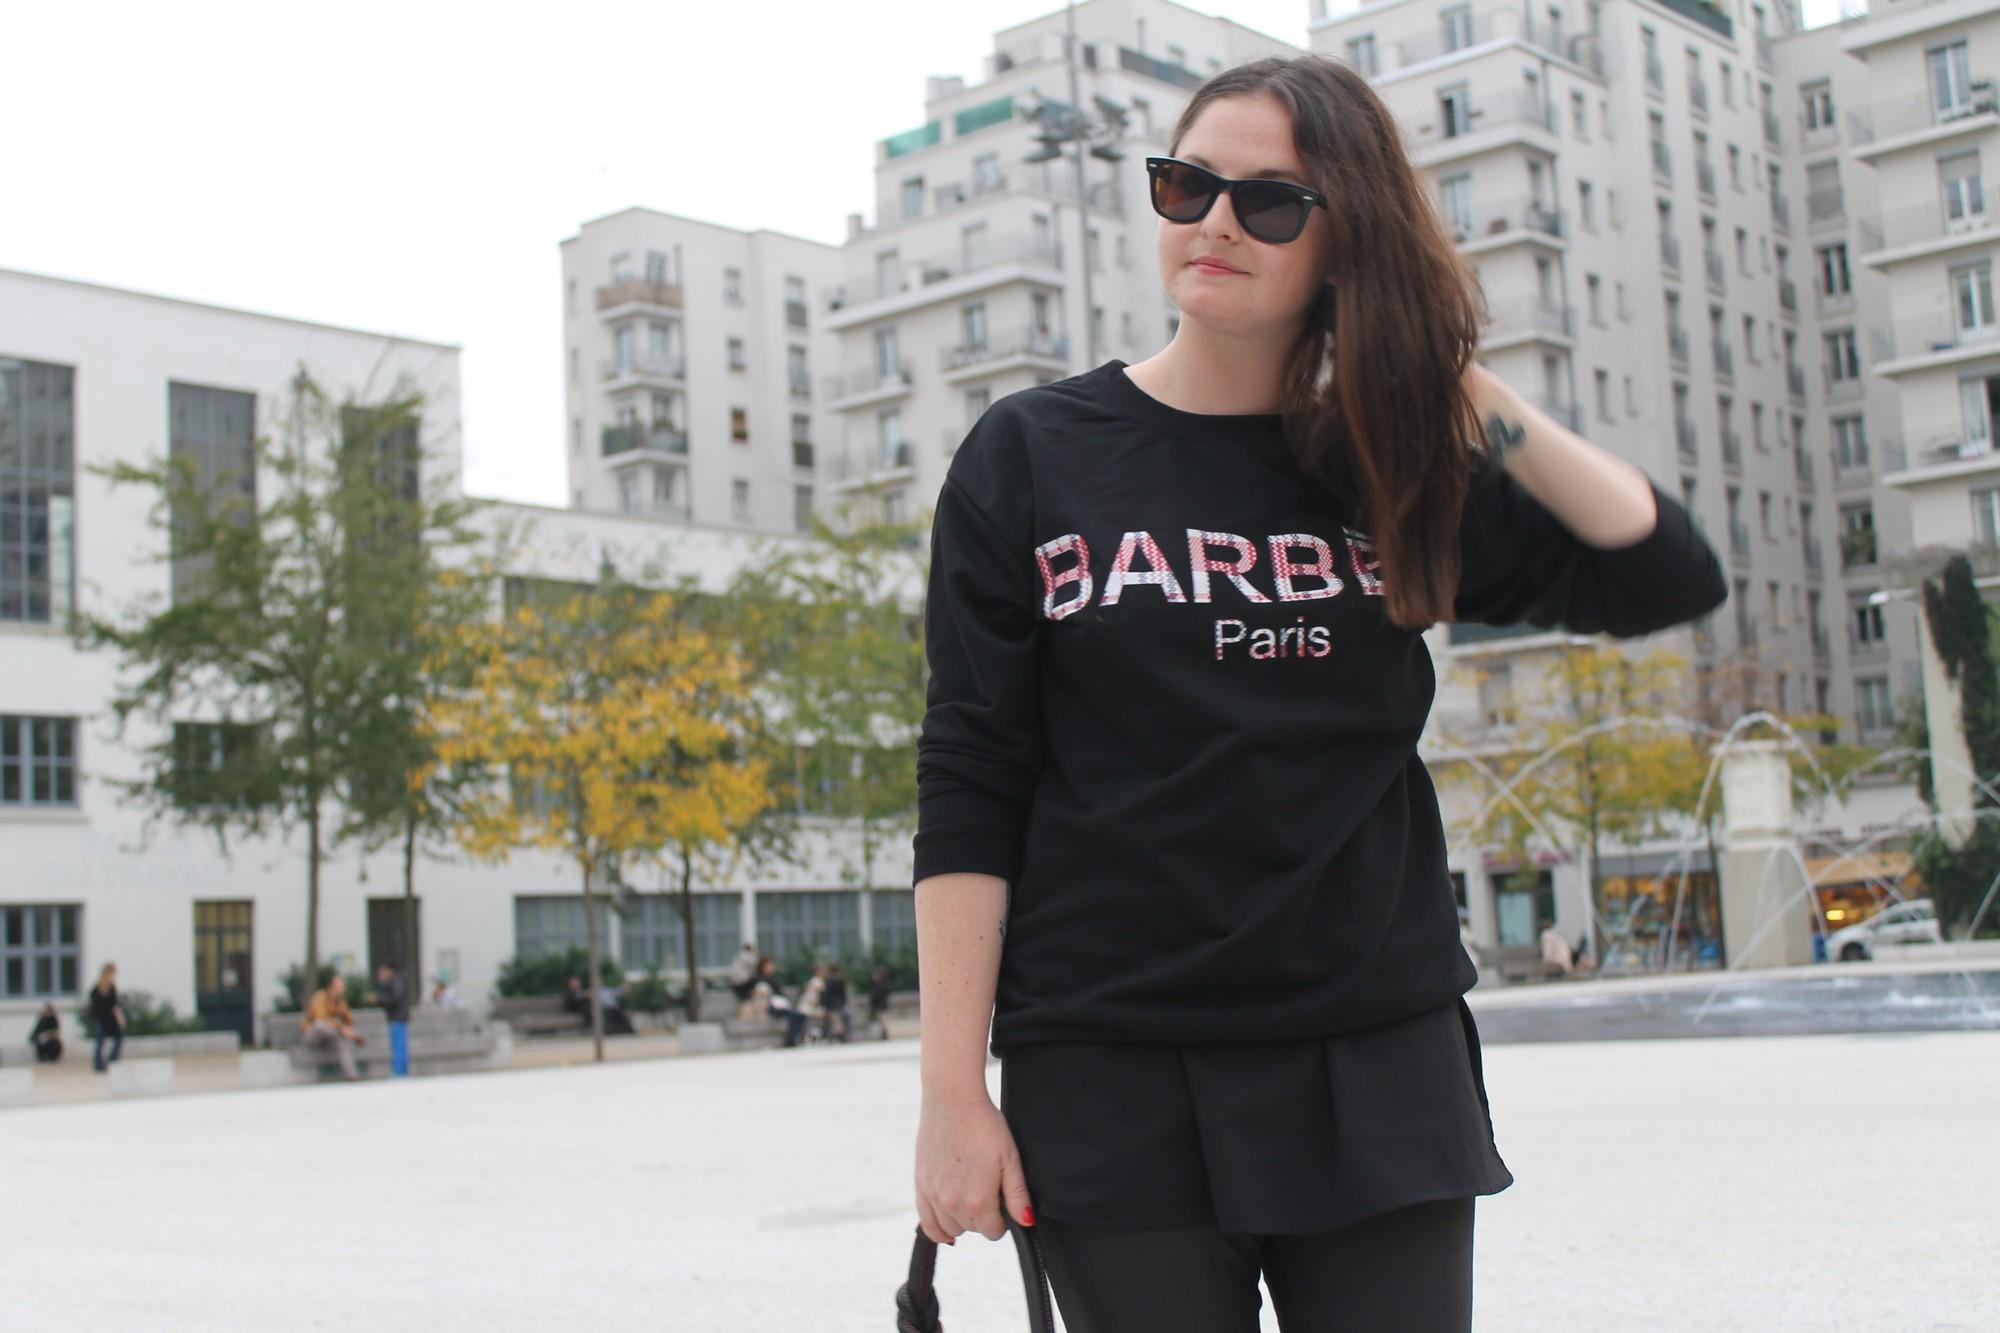 barbes9